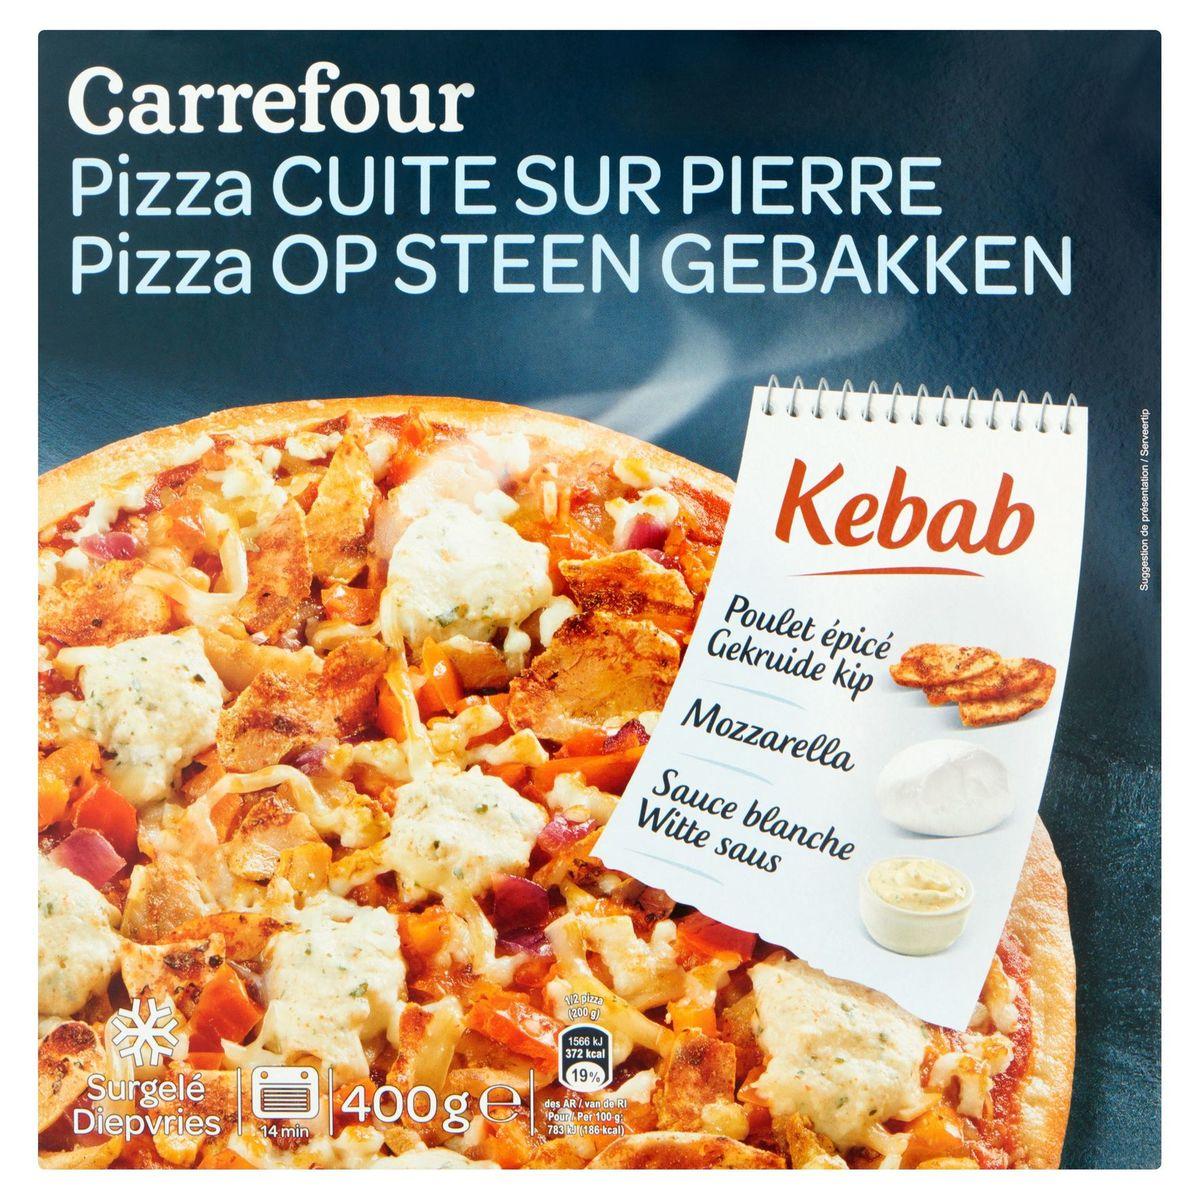 Carrefour Pizza op Steen Gebakken Kebab 400 g